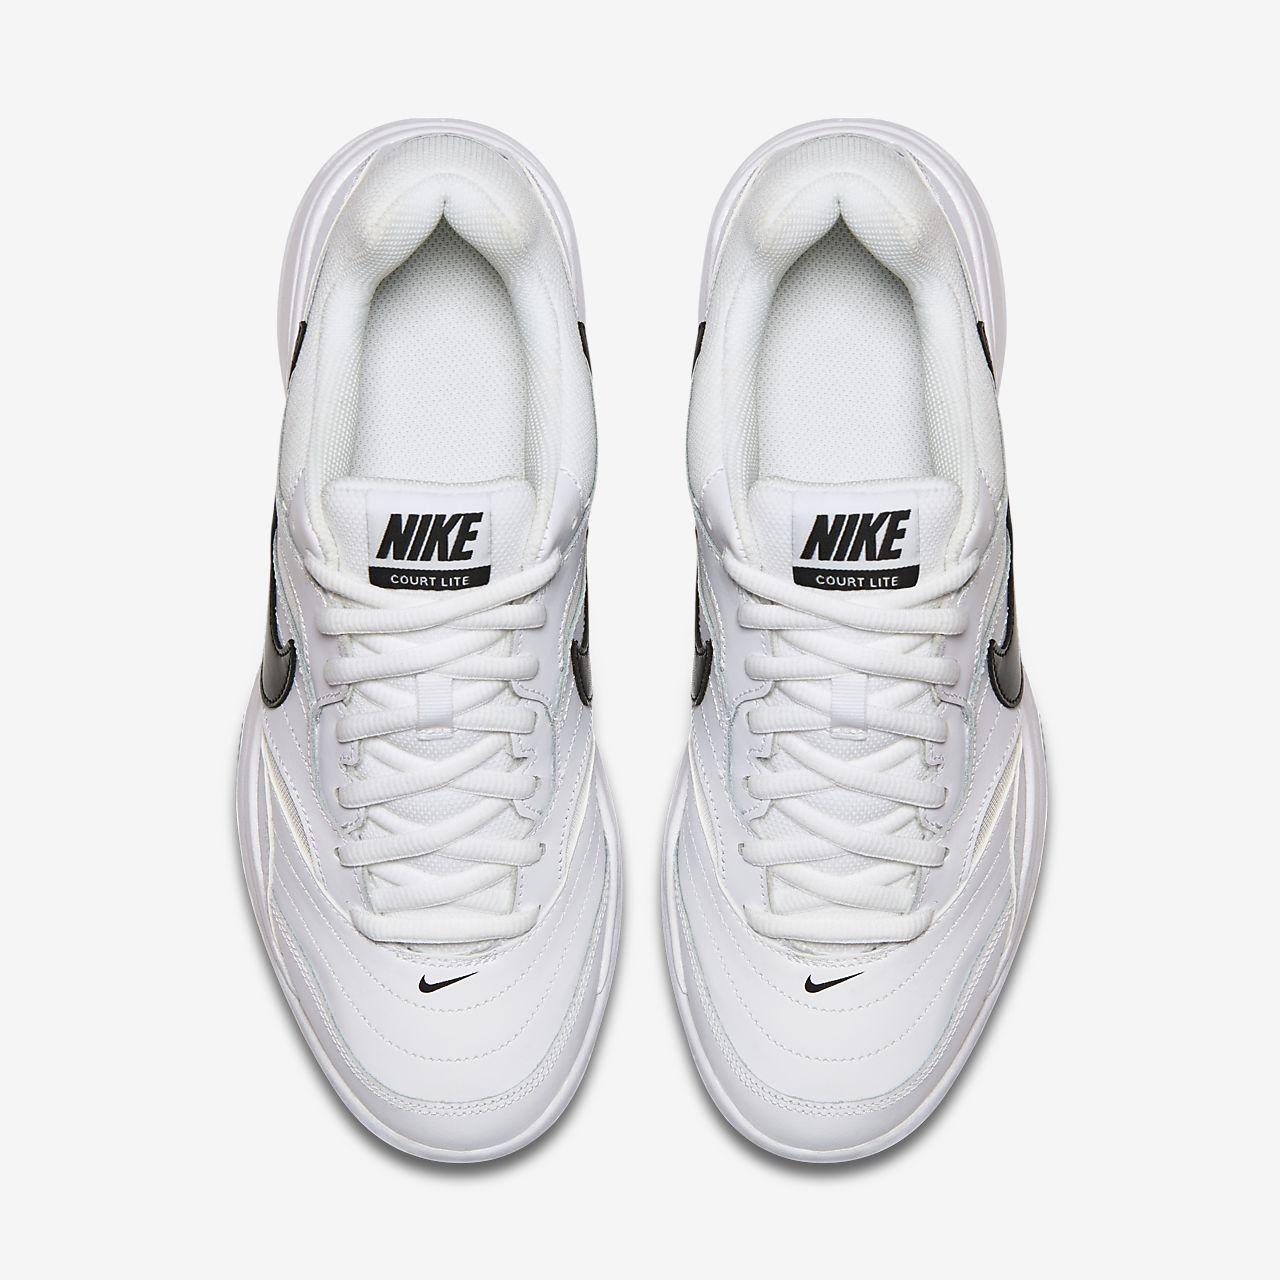 NikeCourt Lite Men's Hard Court Tennis Shoe